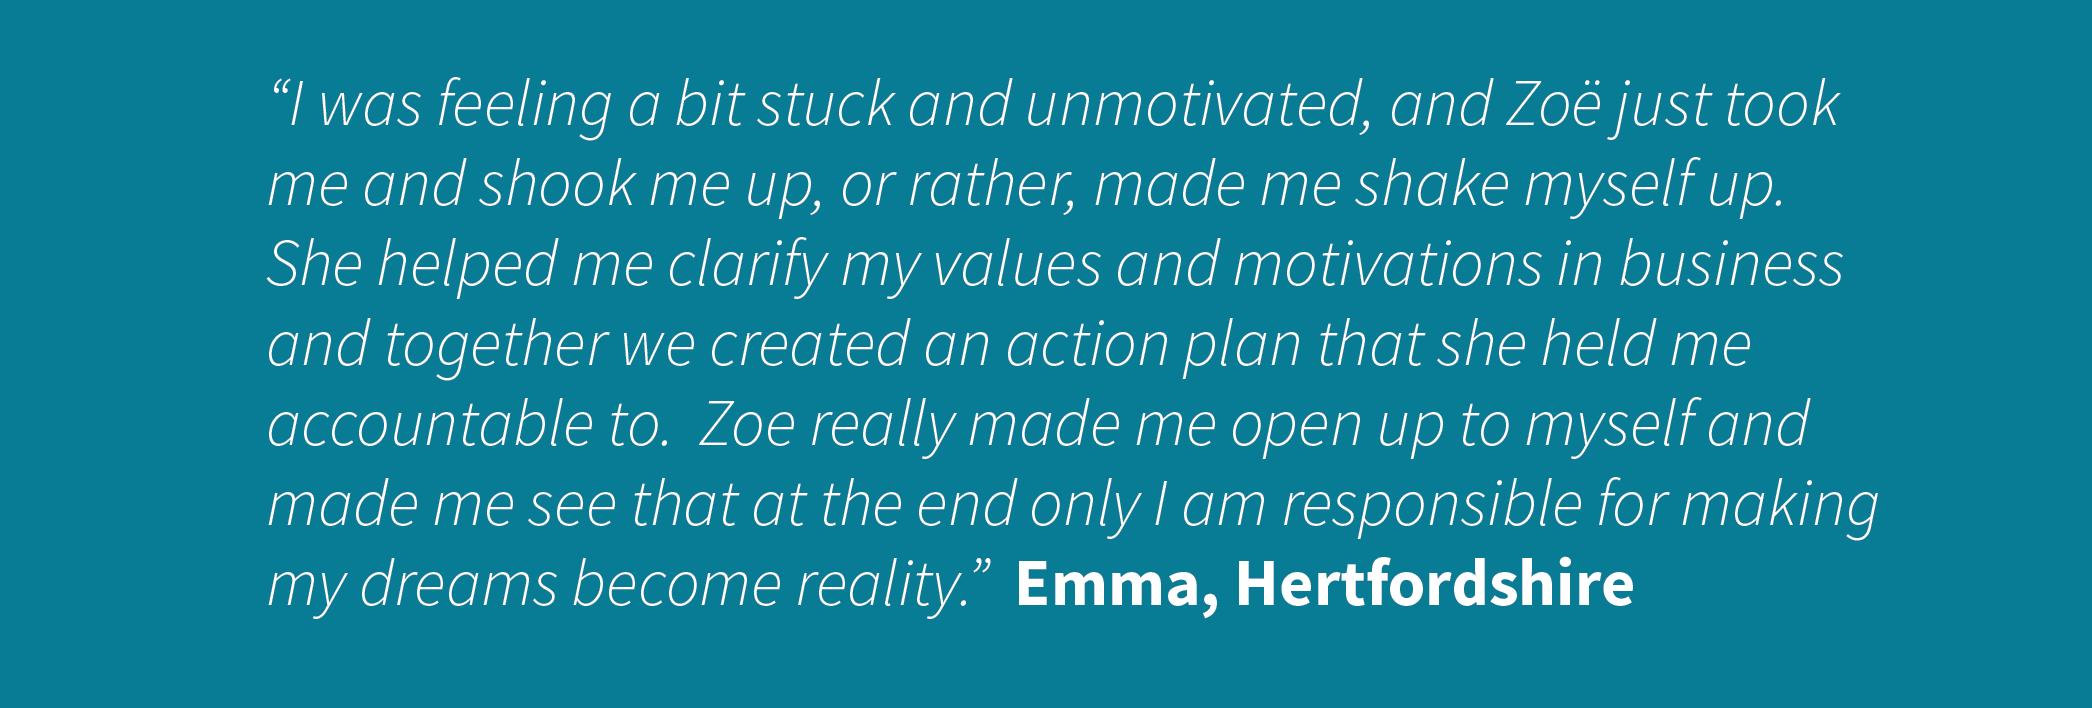 Testimonial, Emma Hertfordshire.png